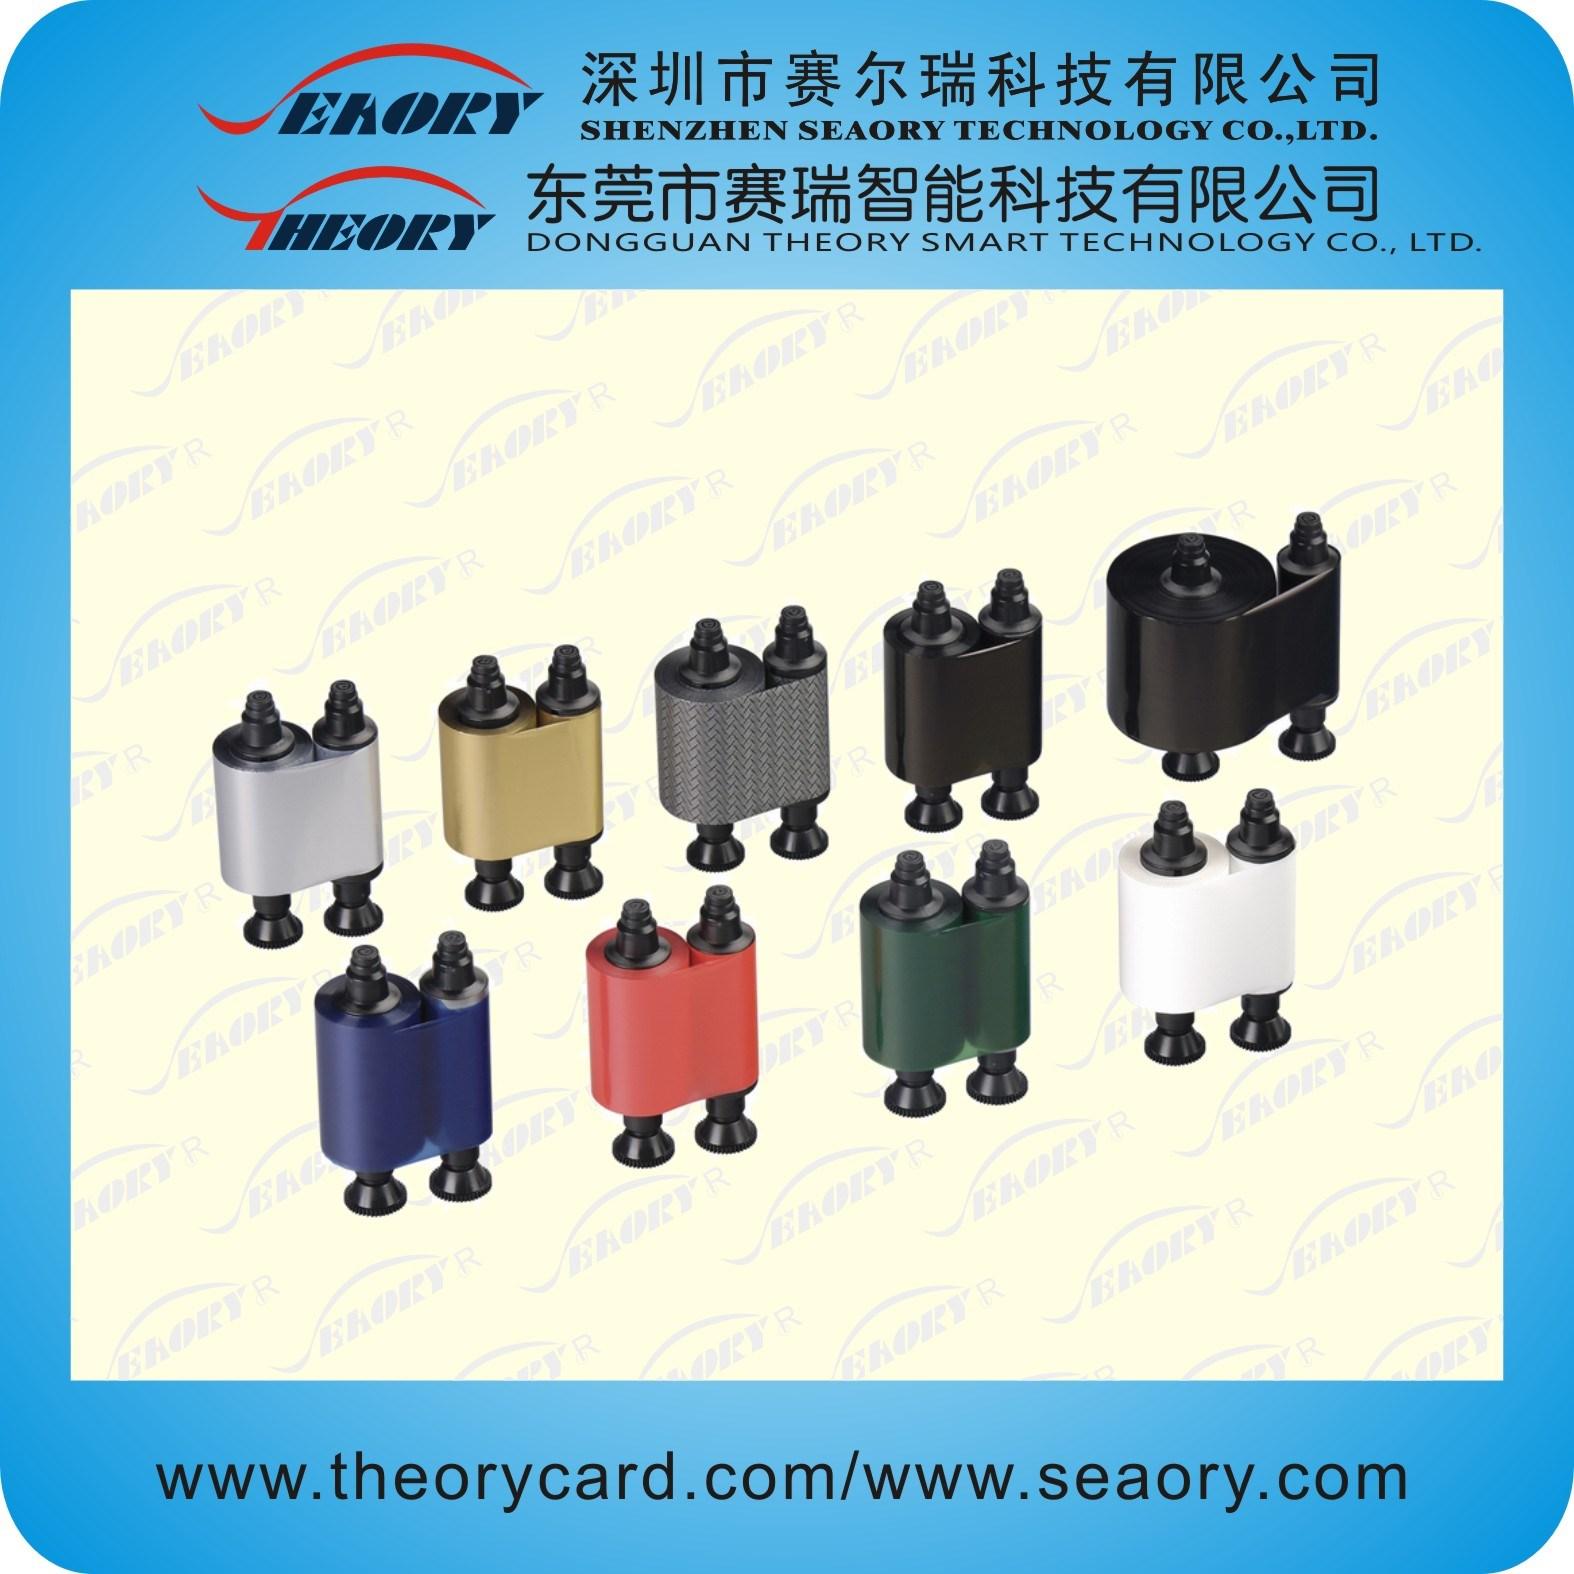 Color Ribbon/Black Ribbon for Smart Card Printer